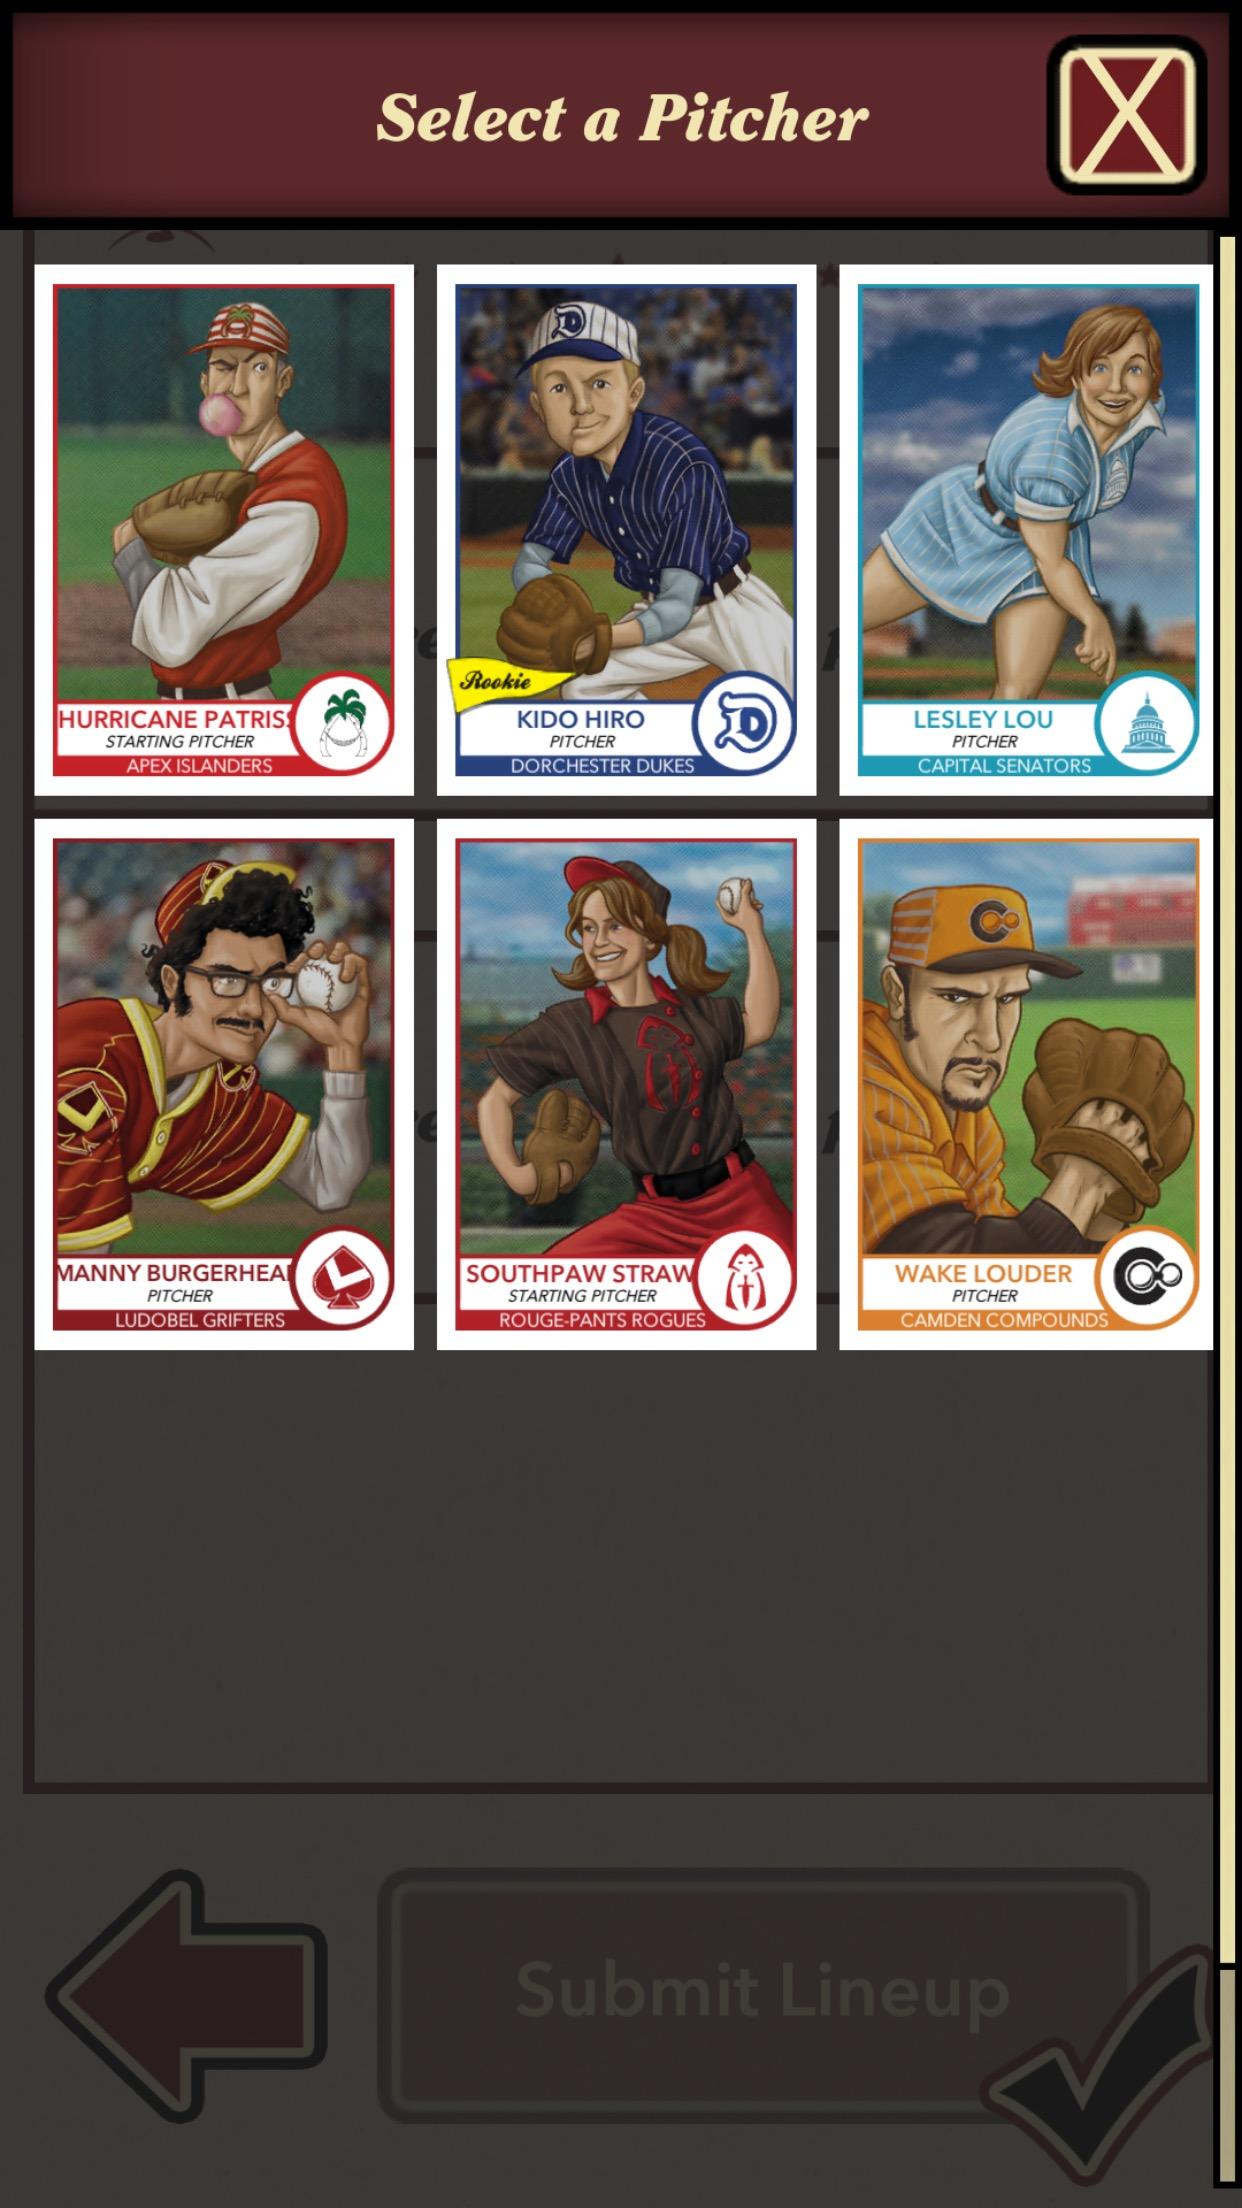 pitcher selection.jpg